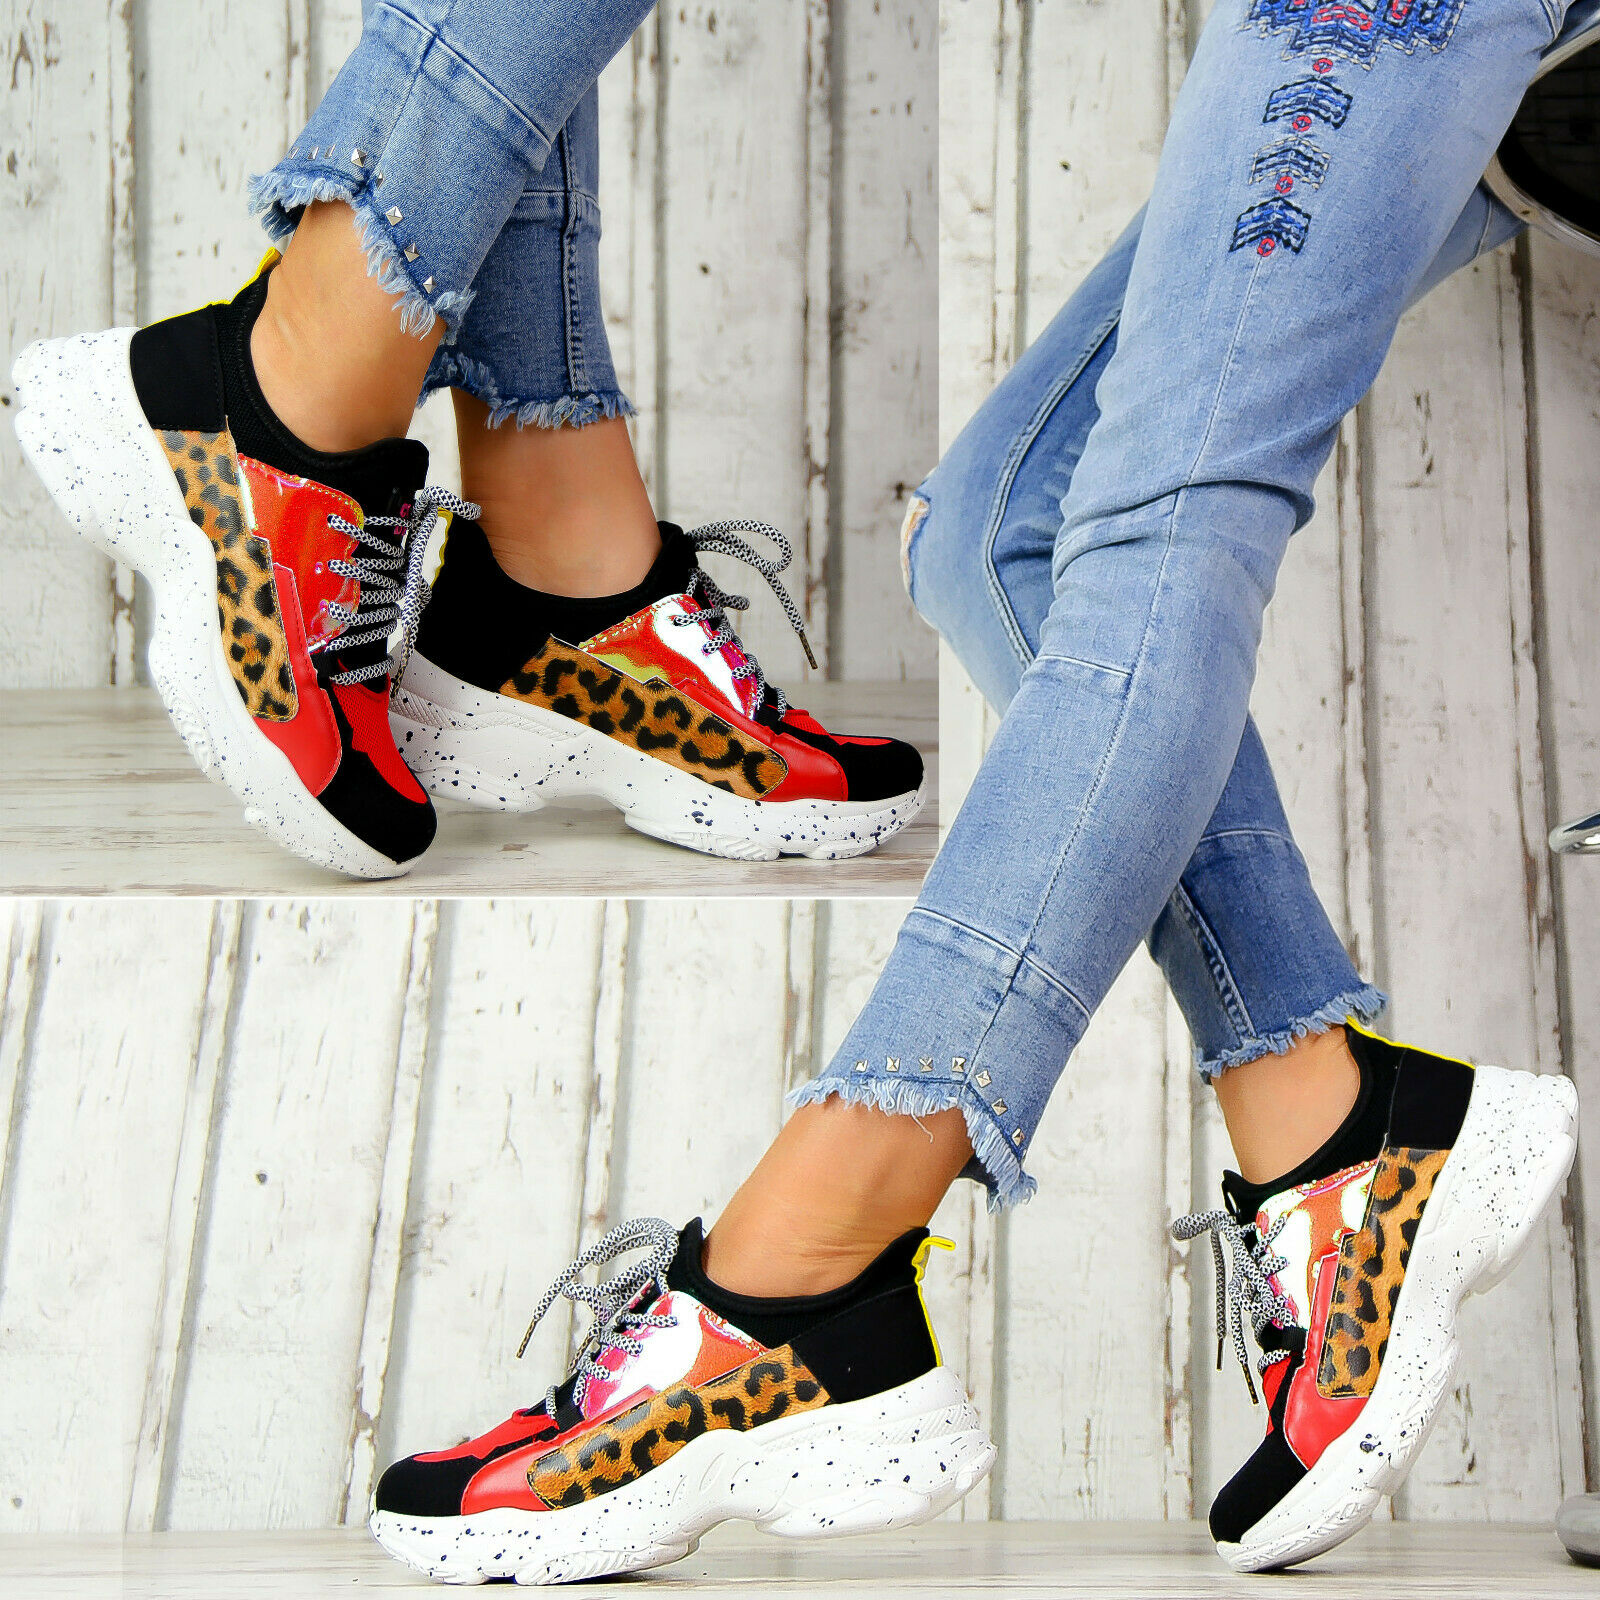 Neu Plateau Sneaker Lack Damen Schuhe Stiefeletten Metallic Style Lack Leo Look